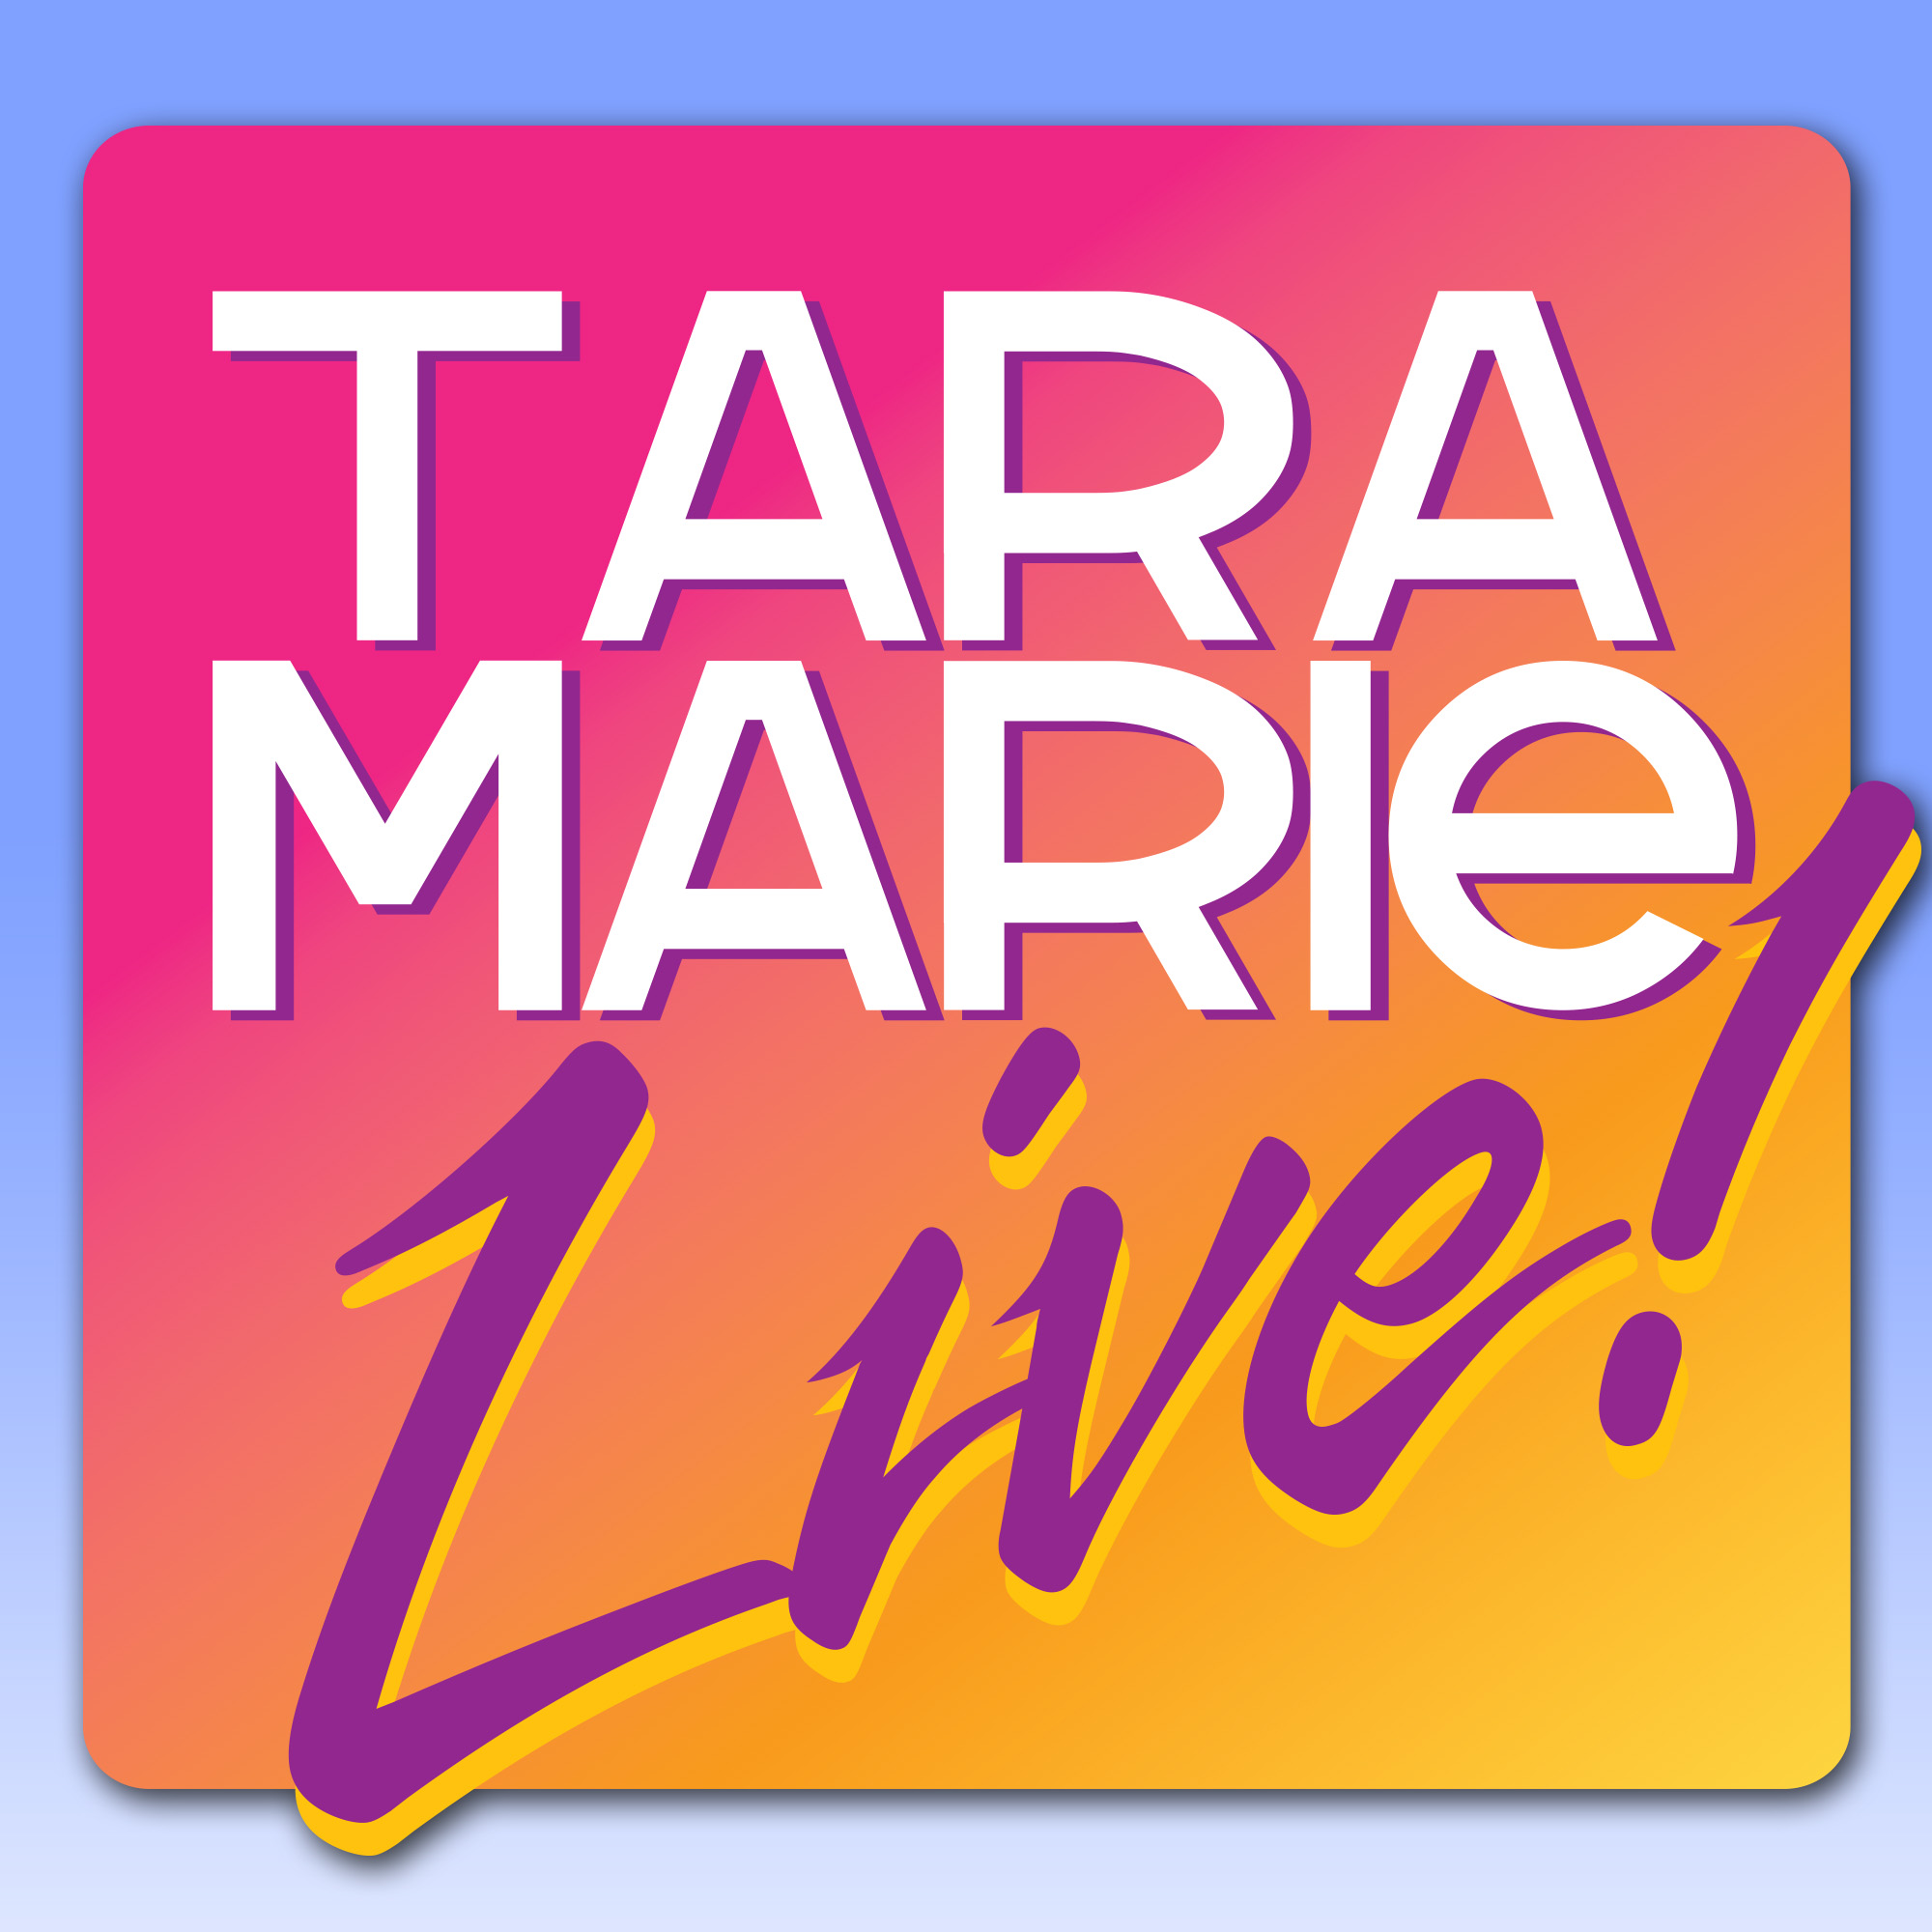 TARA MARIE LIVE! – Mental, Emotional, Physical, Social, and Spiritual Heath show art